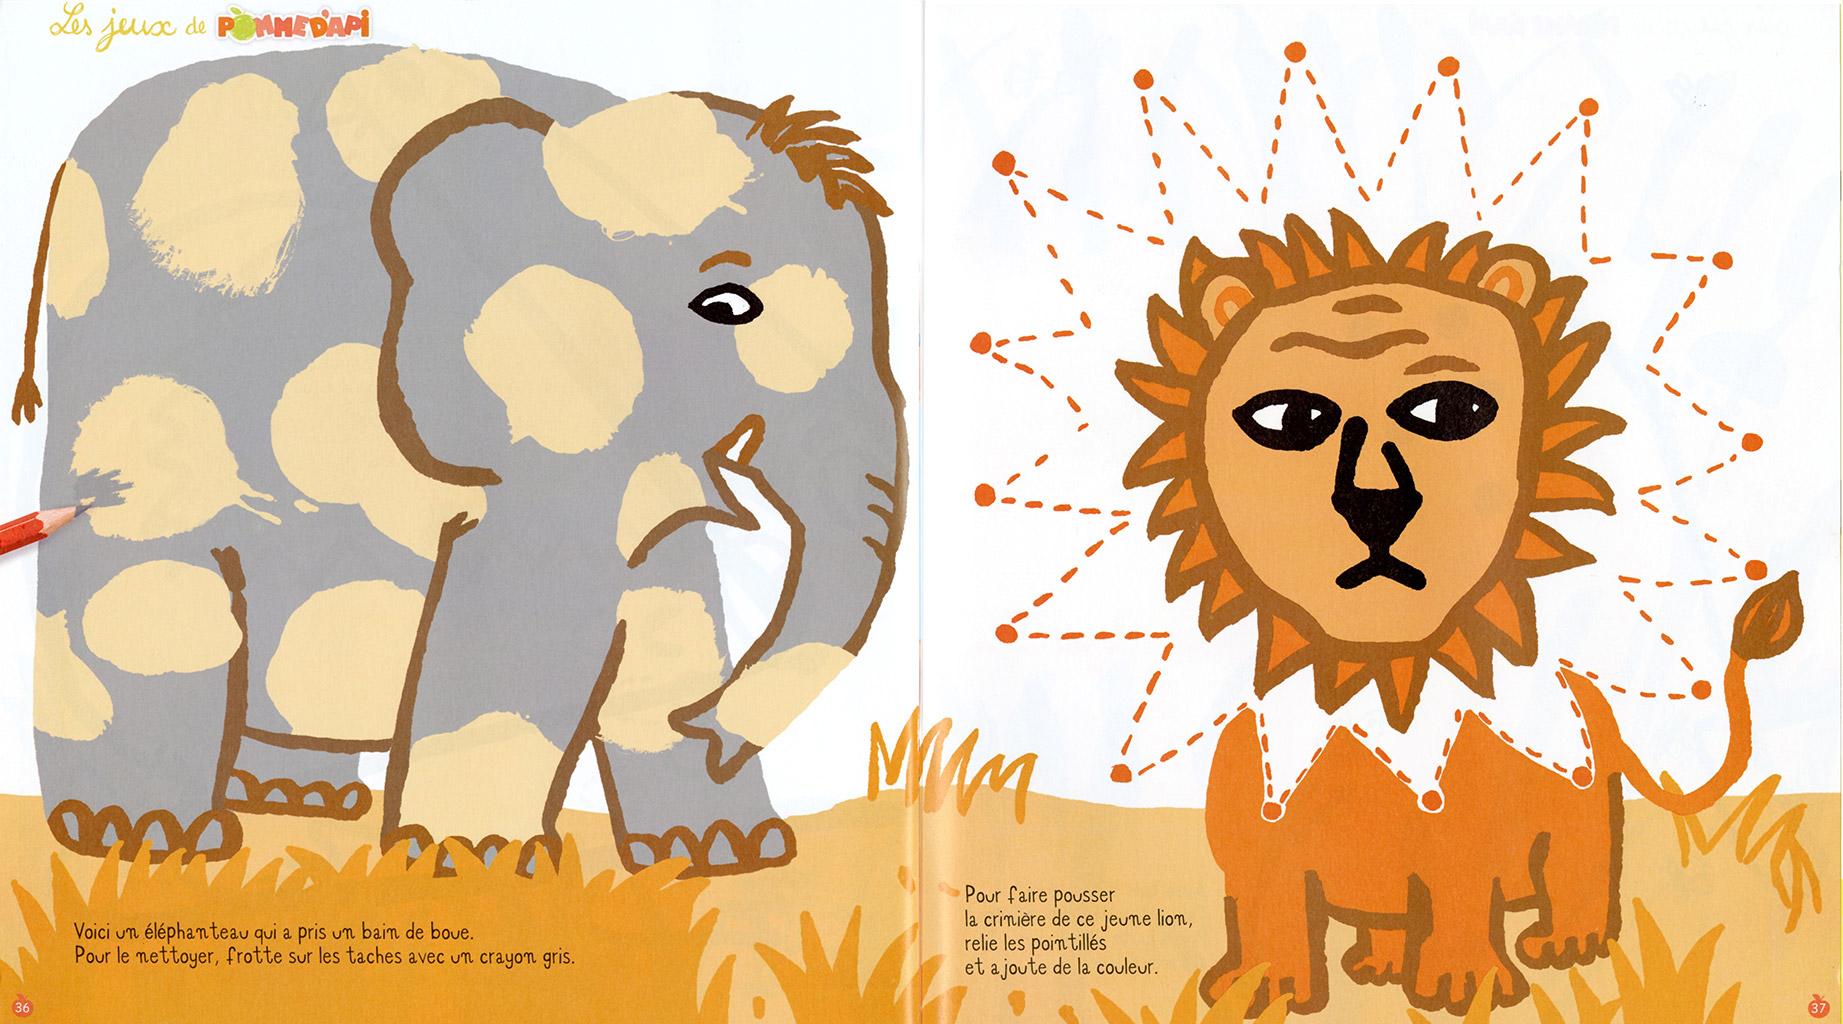 Pomme d'api jeux savane lion éléphant léopart Magali Bardos Bayard presse